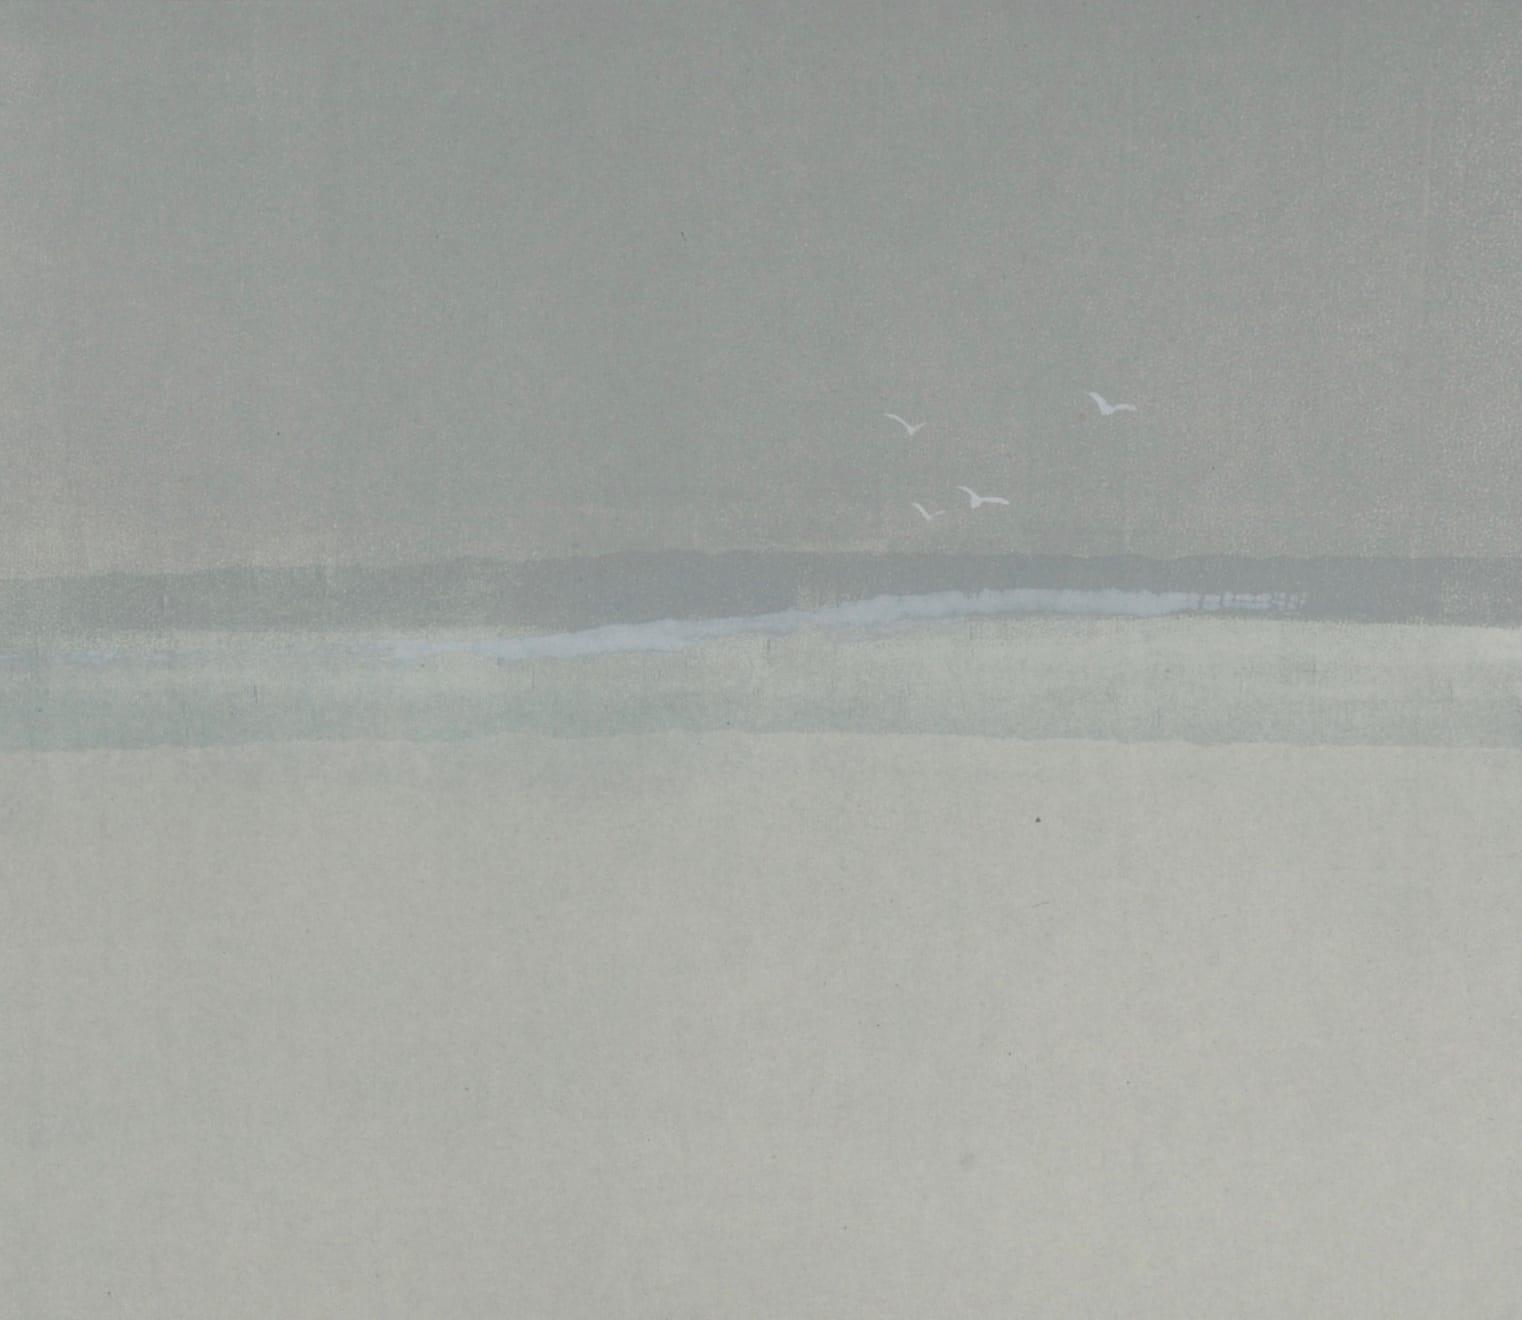 Nigel Swift, Sea Rain, 2020